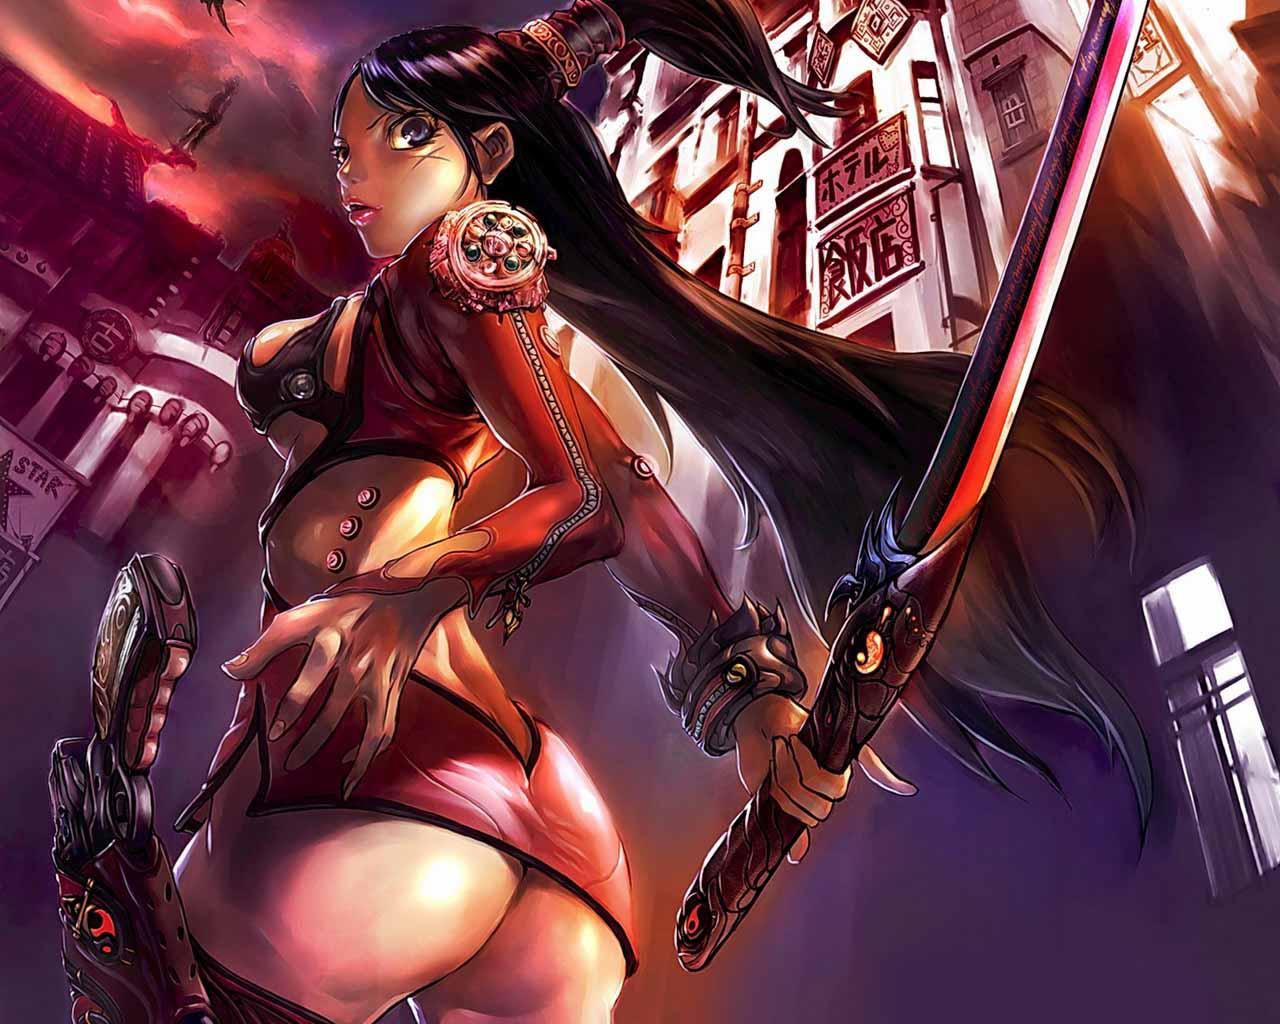 Samurai warrior nude skin erotica clips